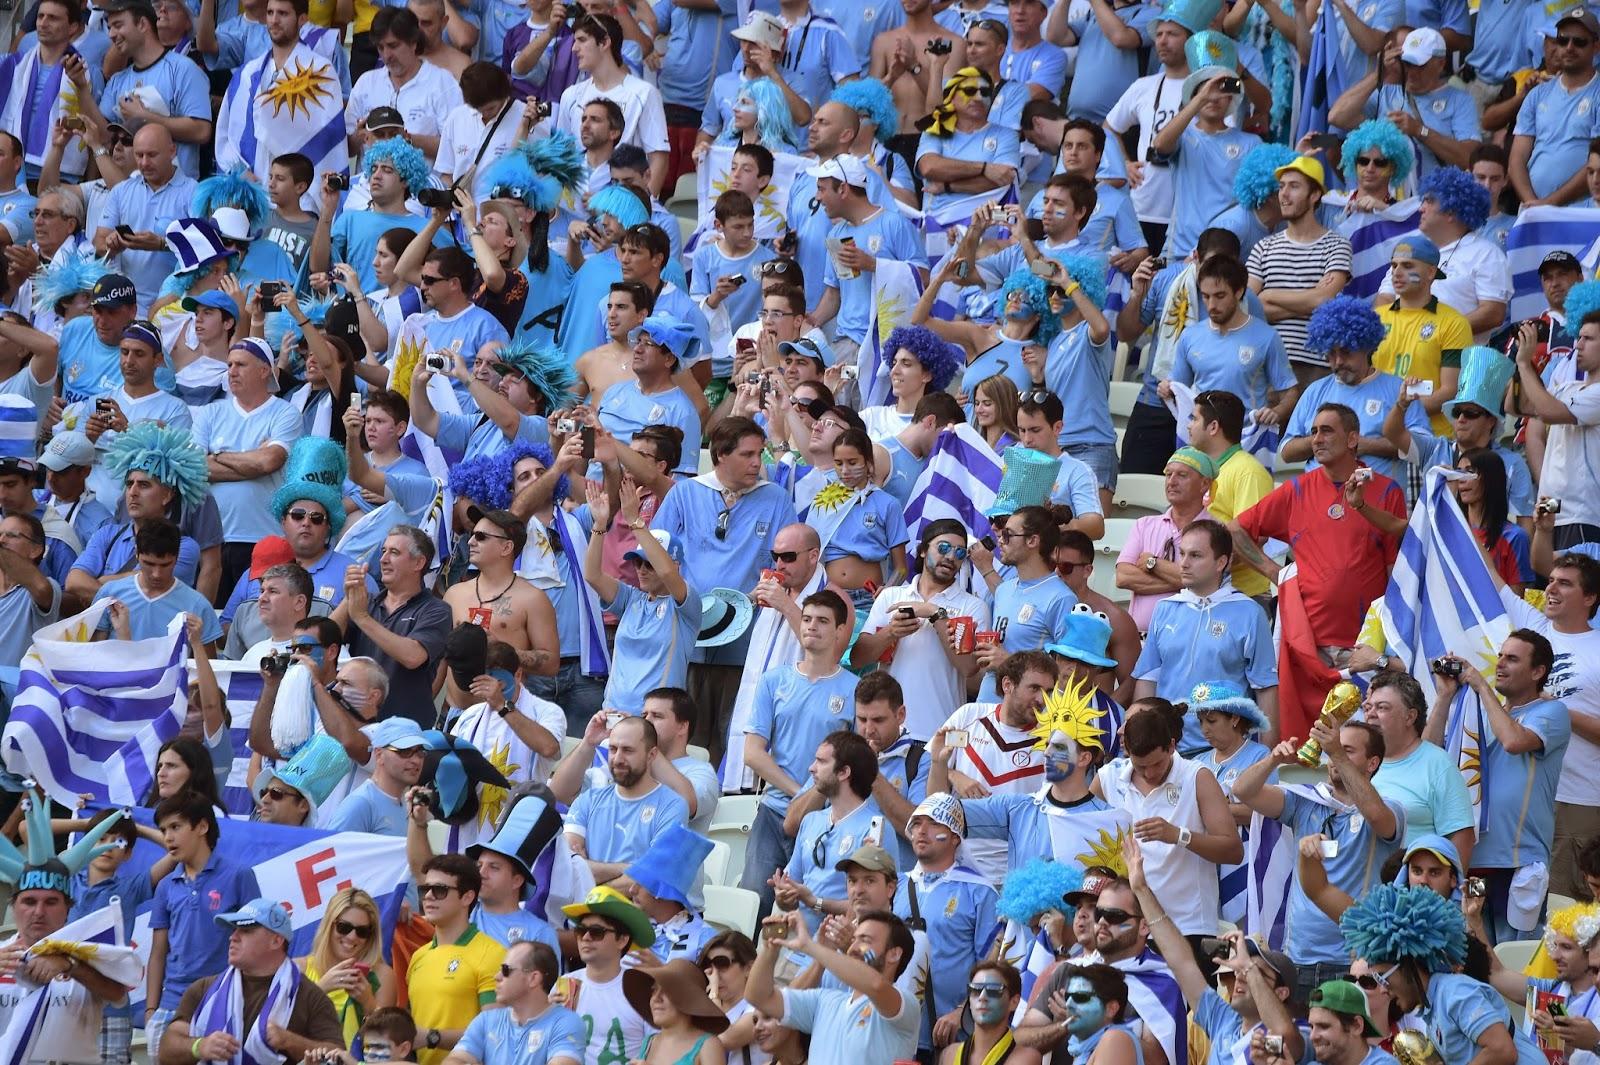 Brazil, Costa Rica Squad, Cristian Rodriguez, Edinson Cavani, FIFA World Cup, FIFA World Cup 2014, Football, Group D, Joel Campbell, Jorge Luis, Oscar Tabarez, Sports, Uruguay Squad, Uruguay vs Costa Rica,